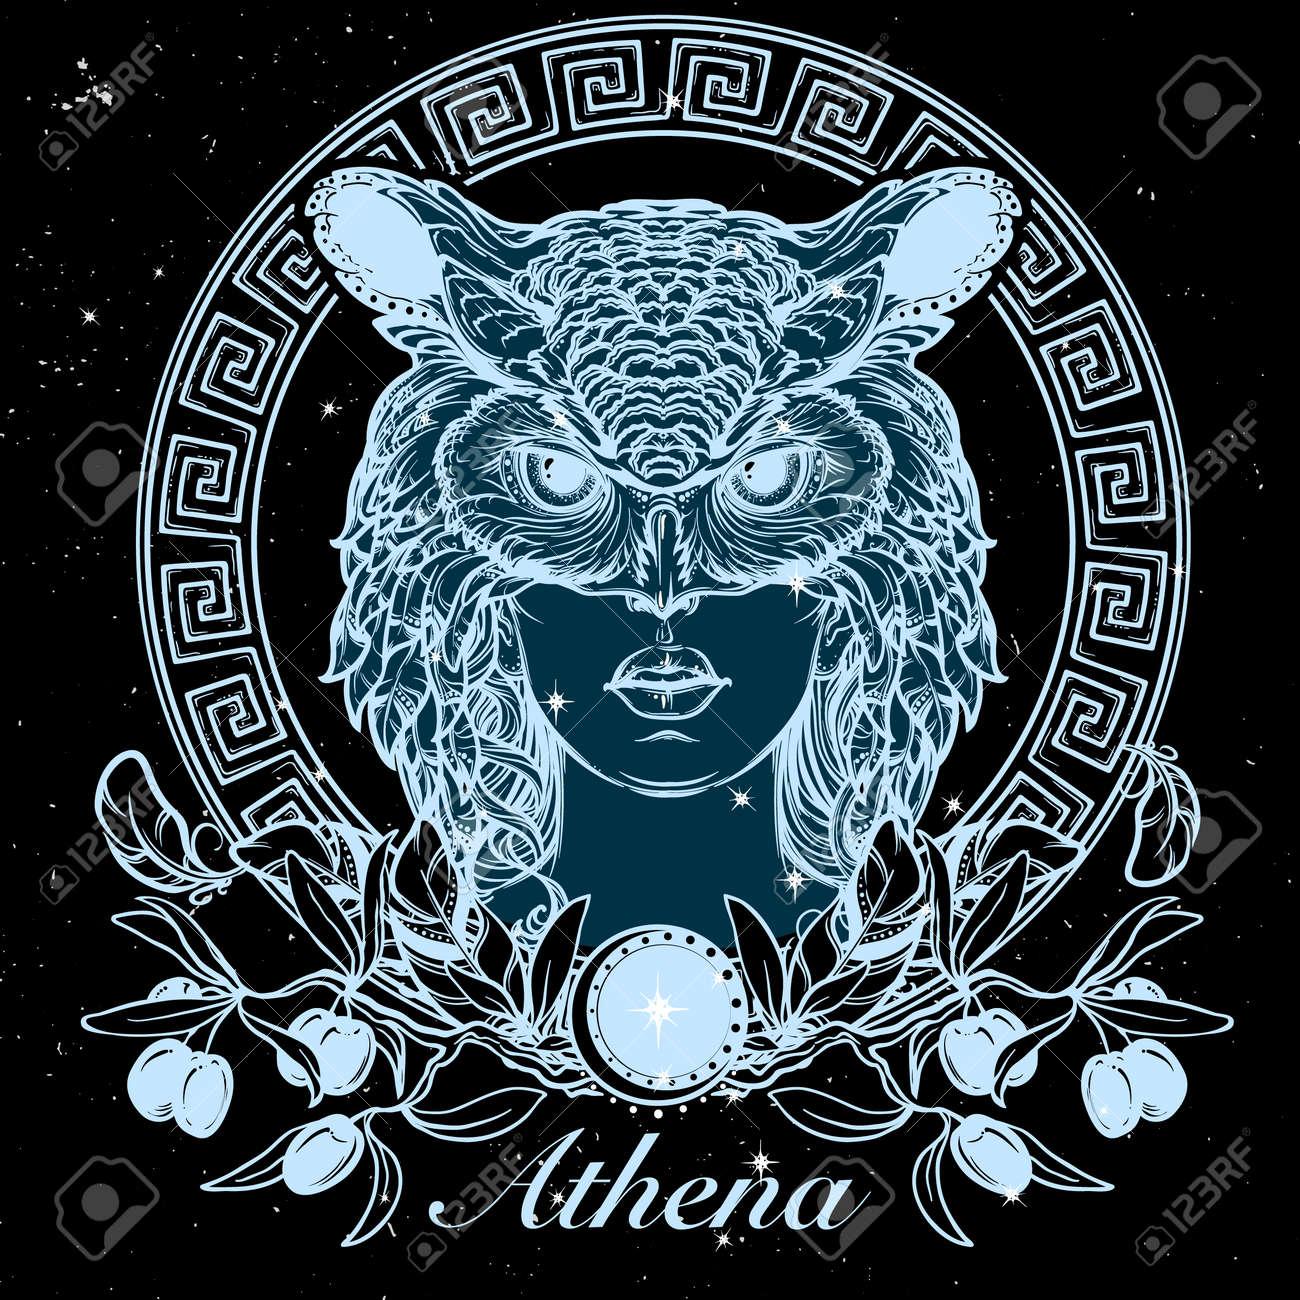 189 Greek Goddess Athena Stock Vector Illustration And Royalty Free